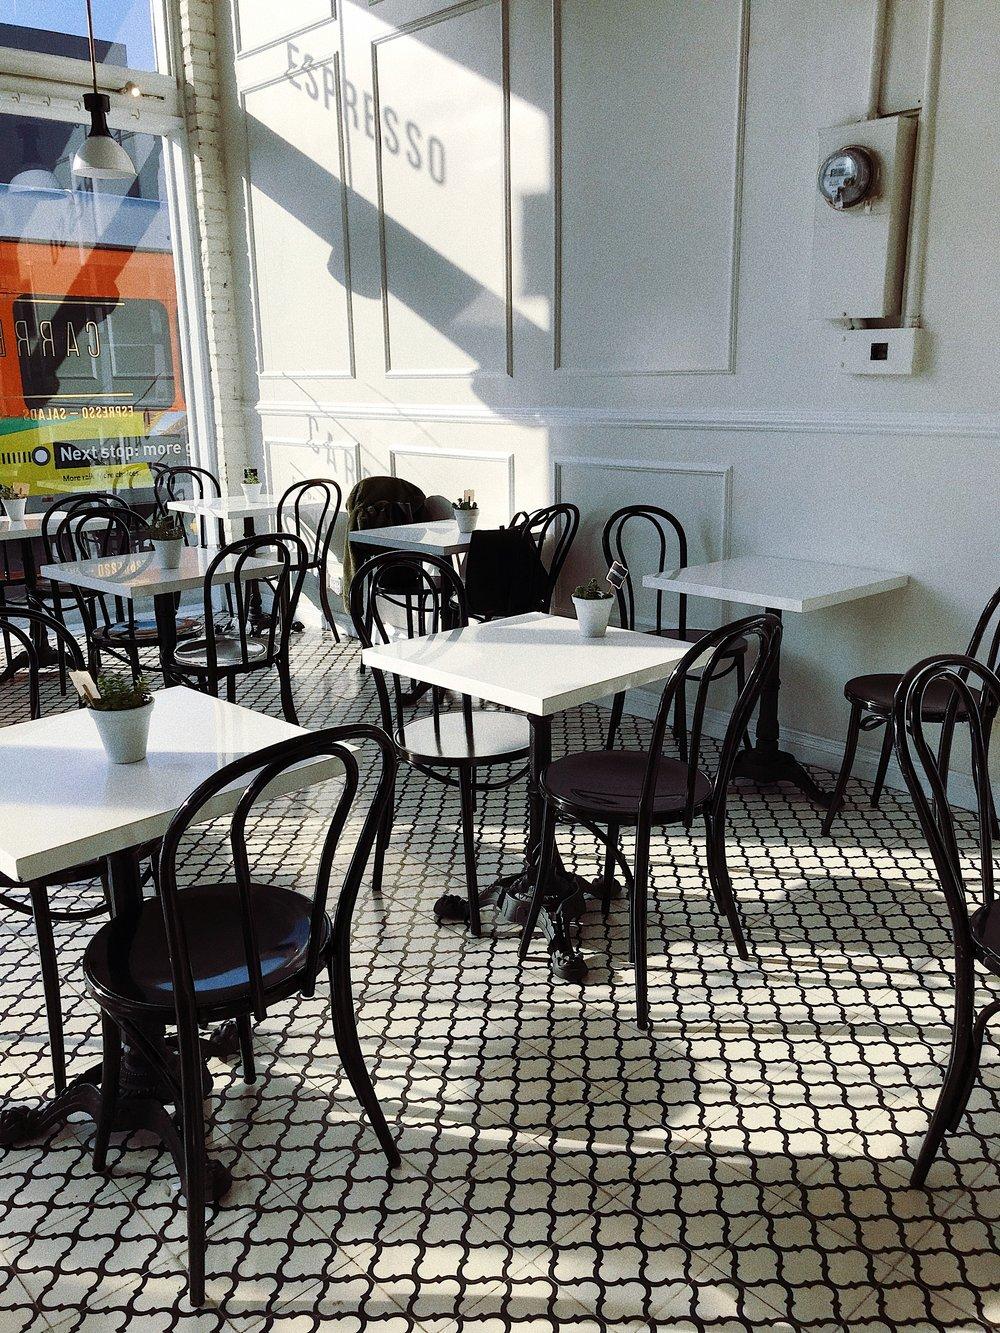 - Carrera Cafe, Melrose Ave